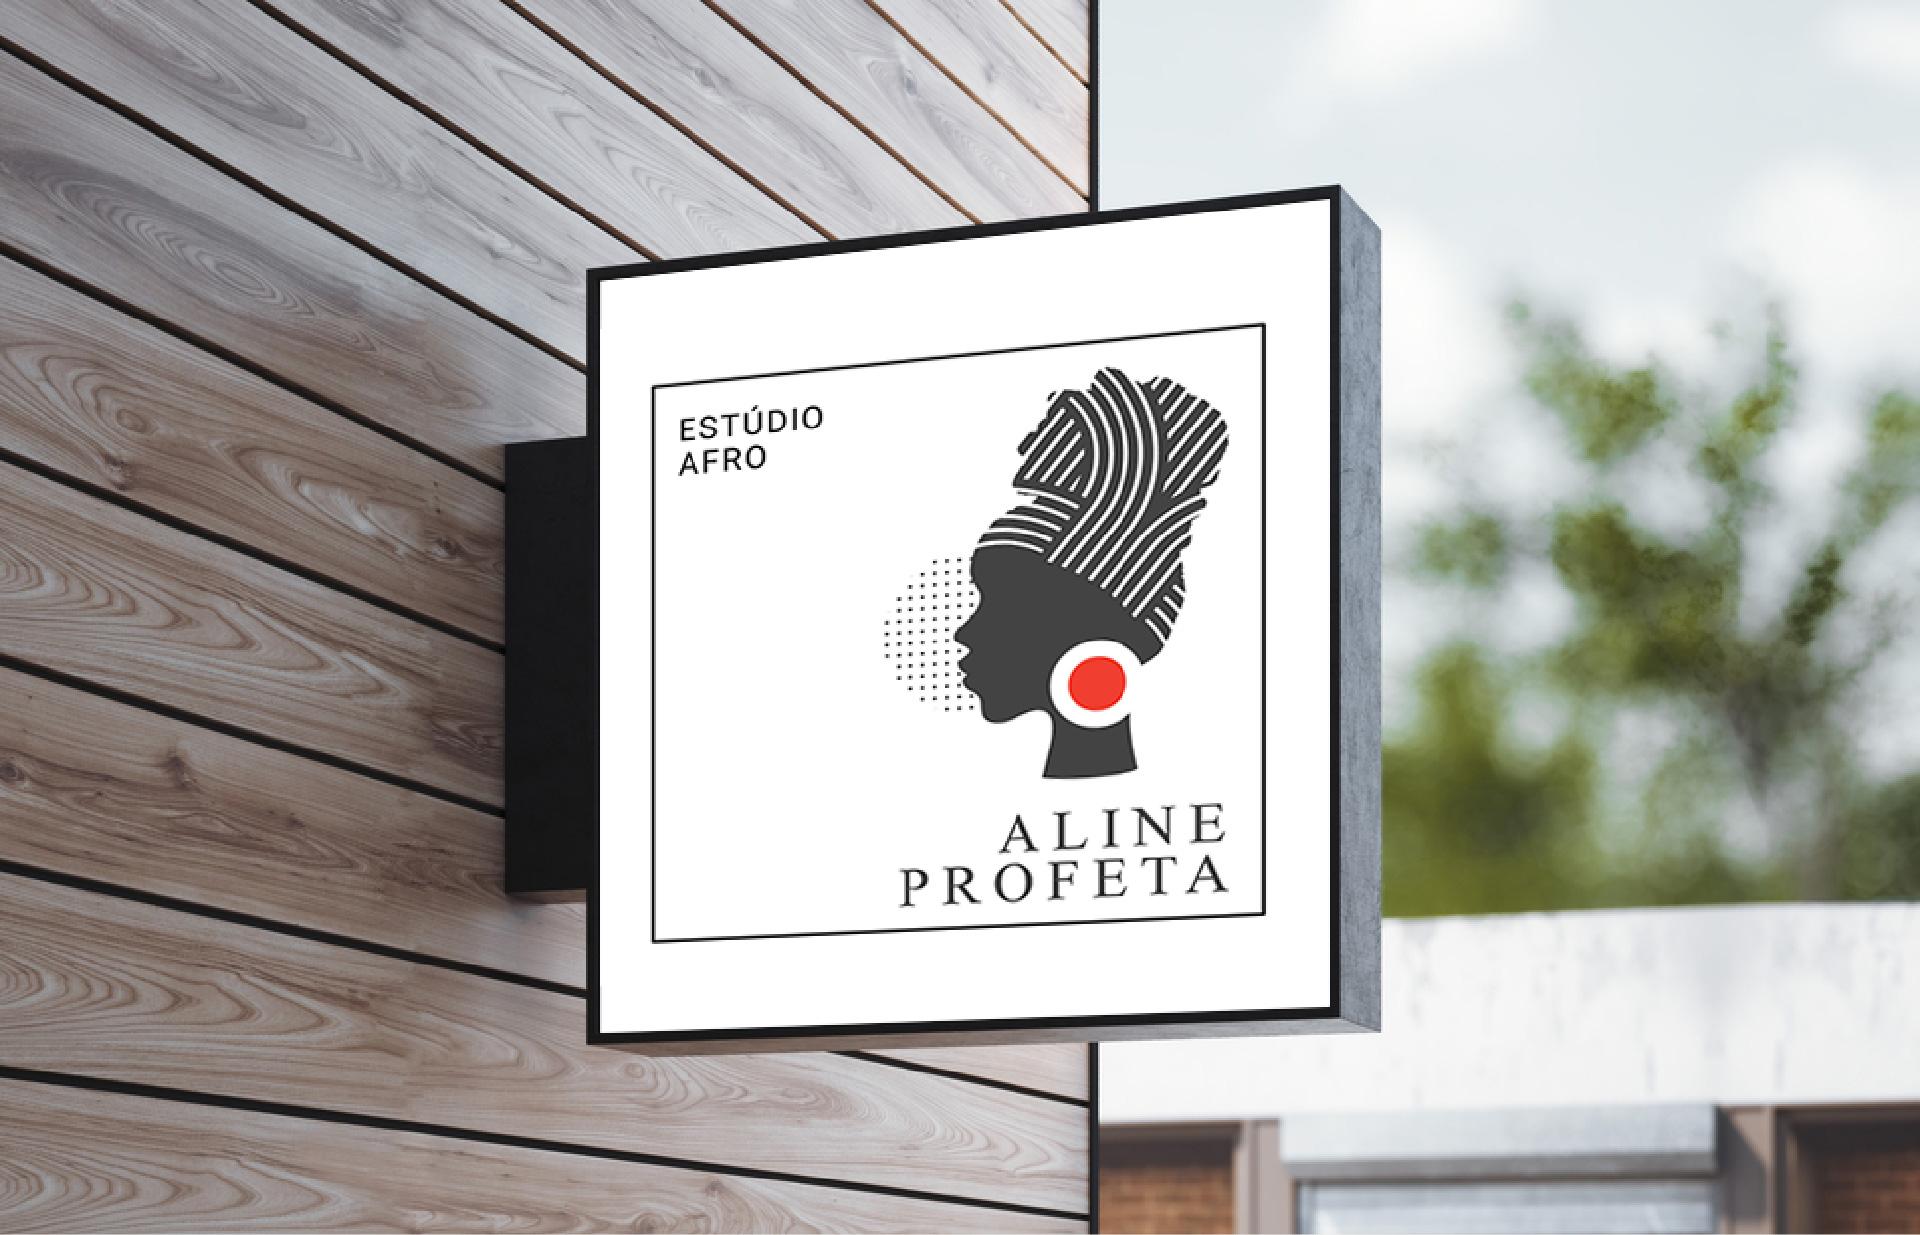 Artboard 22aline-profeta